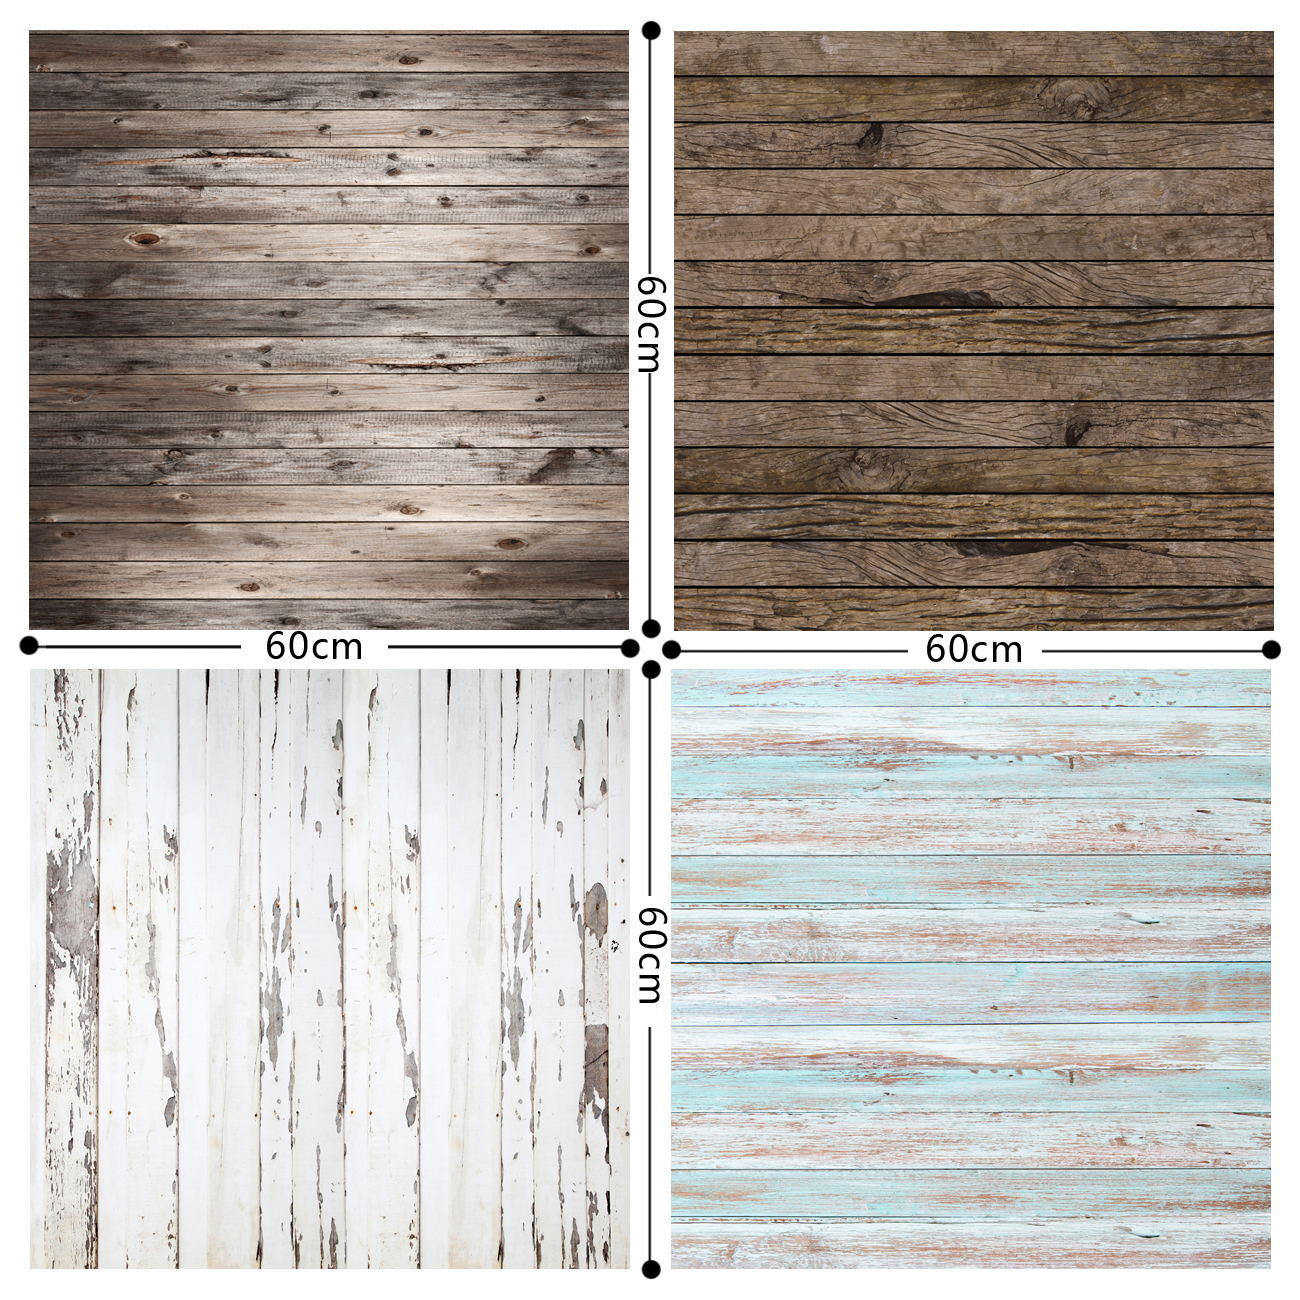 HUAYI Small Size 0 6x0 6m Wooden Floor backdrop Art Fabric photography backdrops Photo Studio Prop